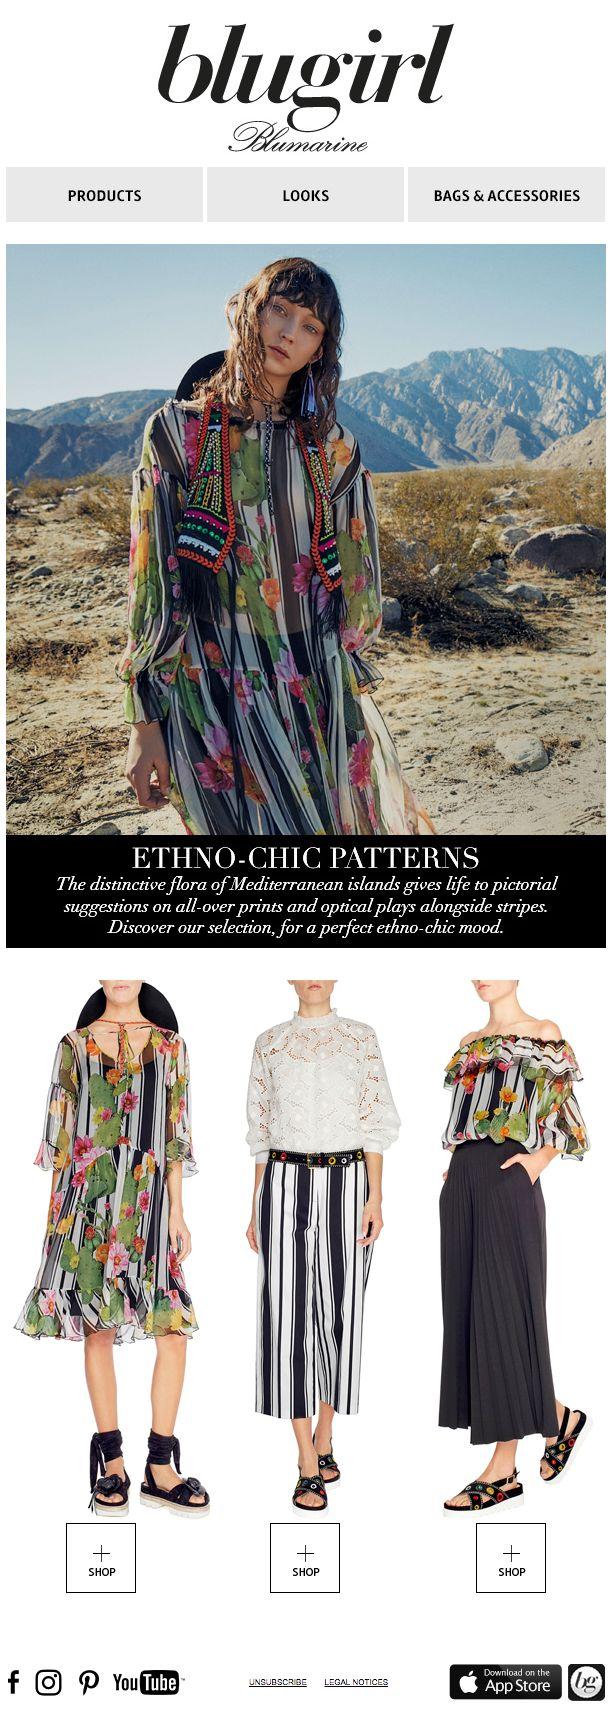 Etno-Chic Patterns • Blugirl Spring Summer 2017 Collection